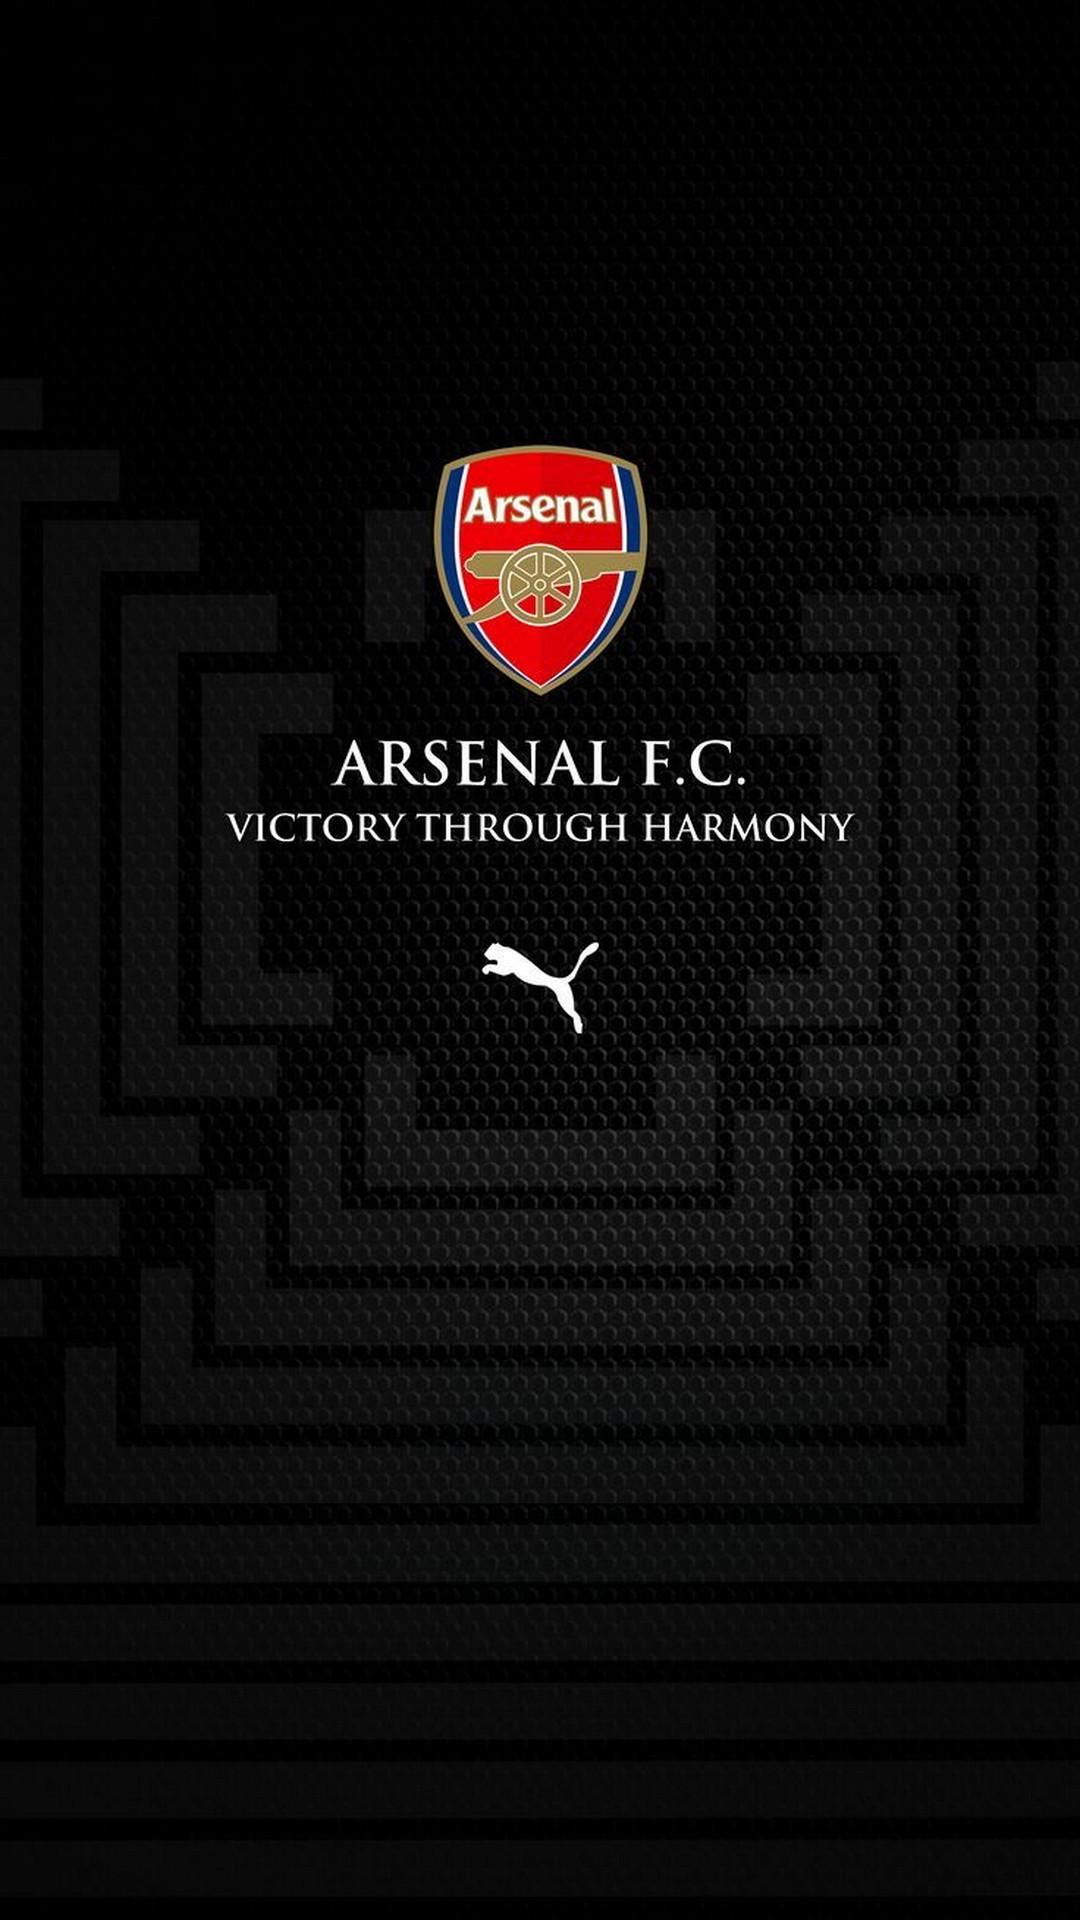 Arsenal FC Wallpaper iPhone 2019 3D iPhone Wallpaper 1080x1920